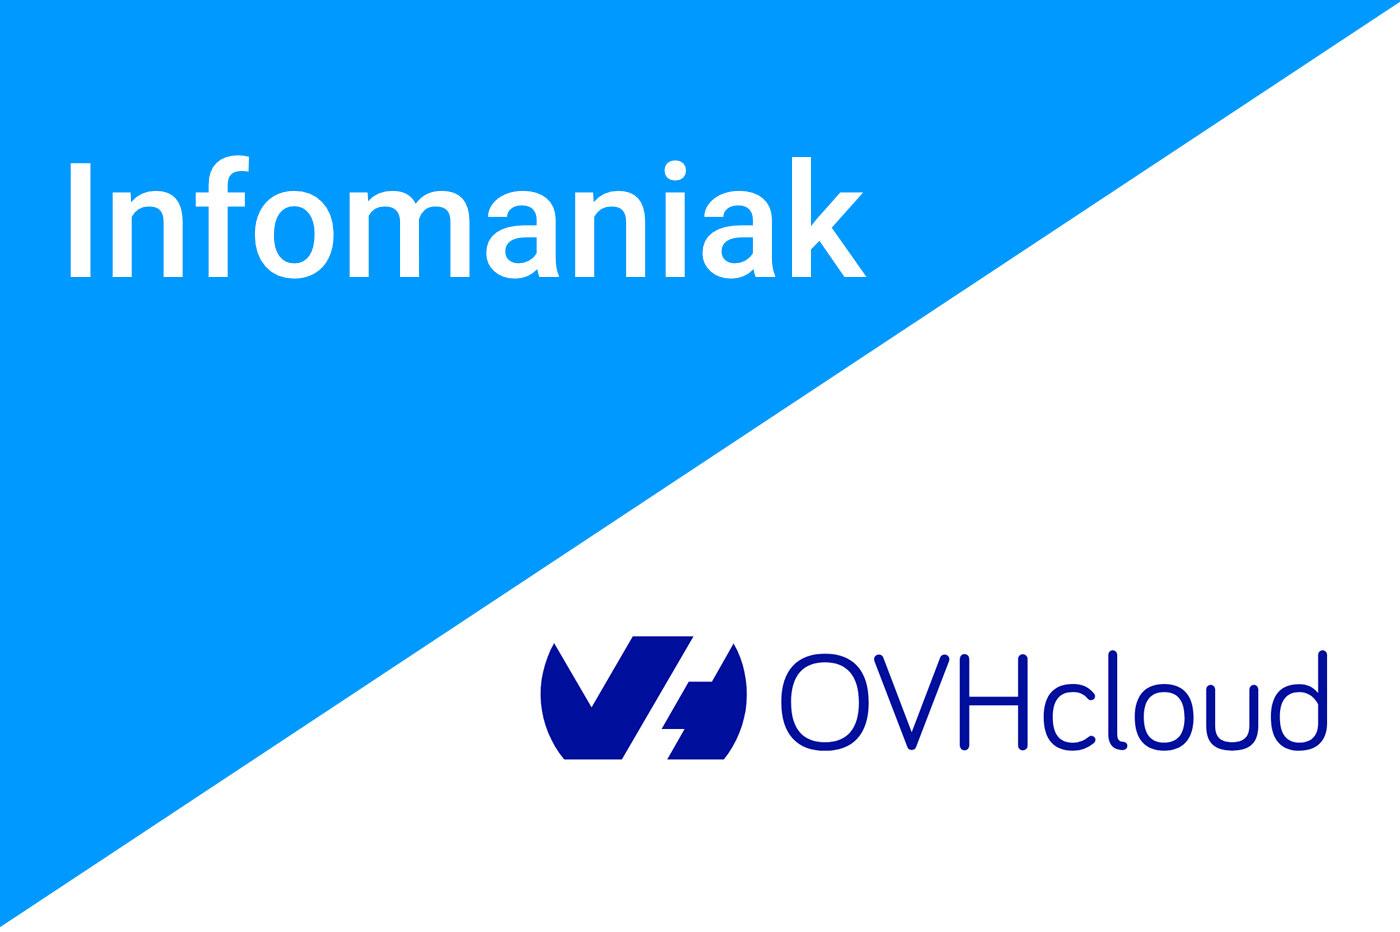 Comparatif OVH vs Infomaniak